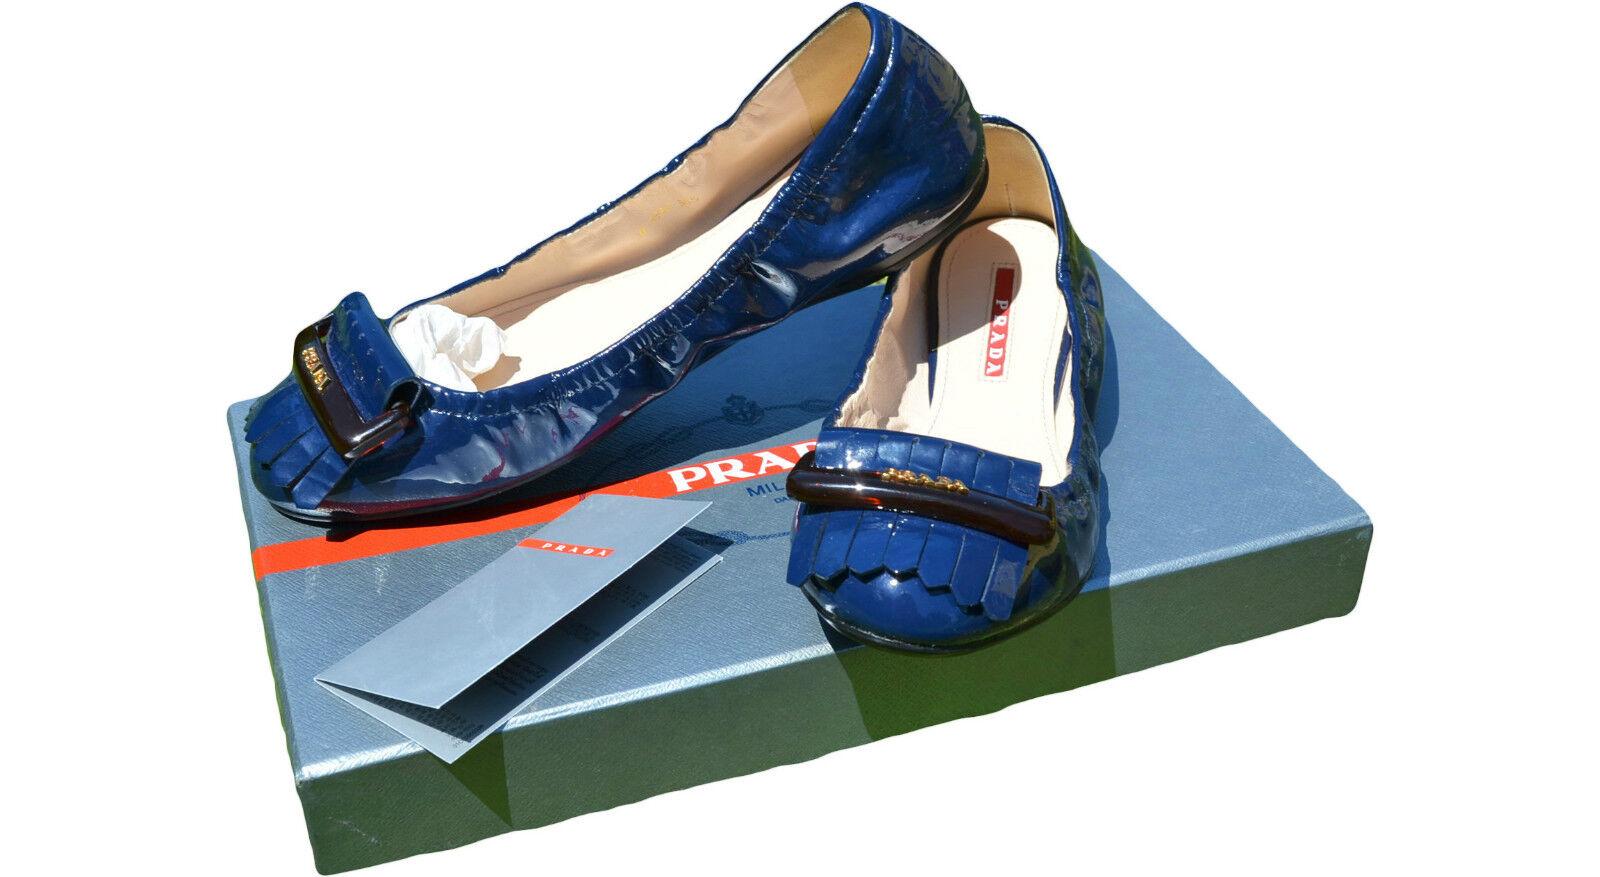 Prada nuevo para mujer Charol Mojado Azul Azul Azul Zapatos Planos Bailarina Talla 36.5 Reino Unido 3.5  ofrecemos varias marcas famosas